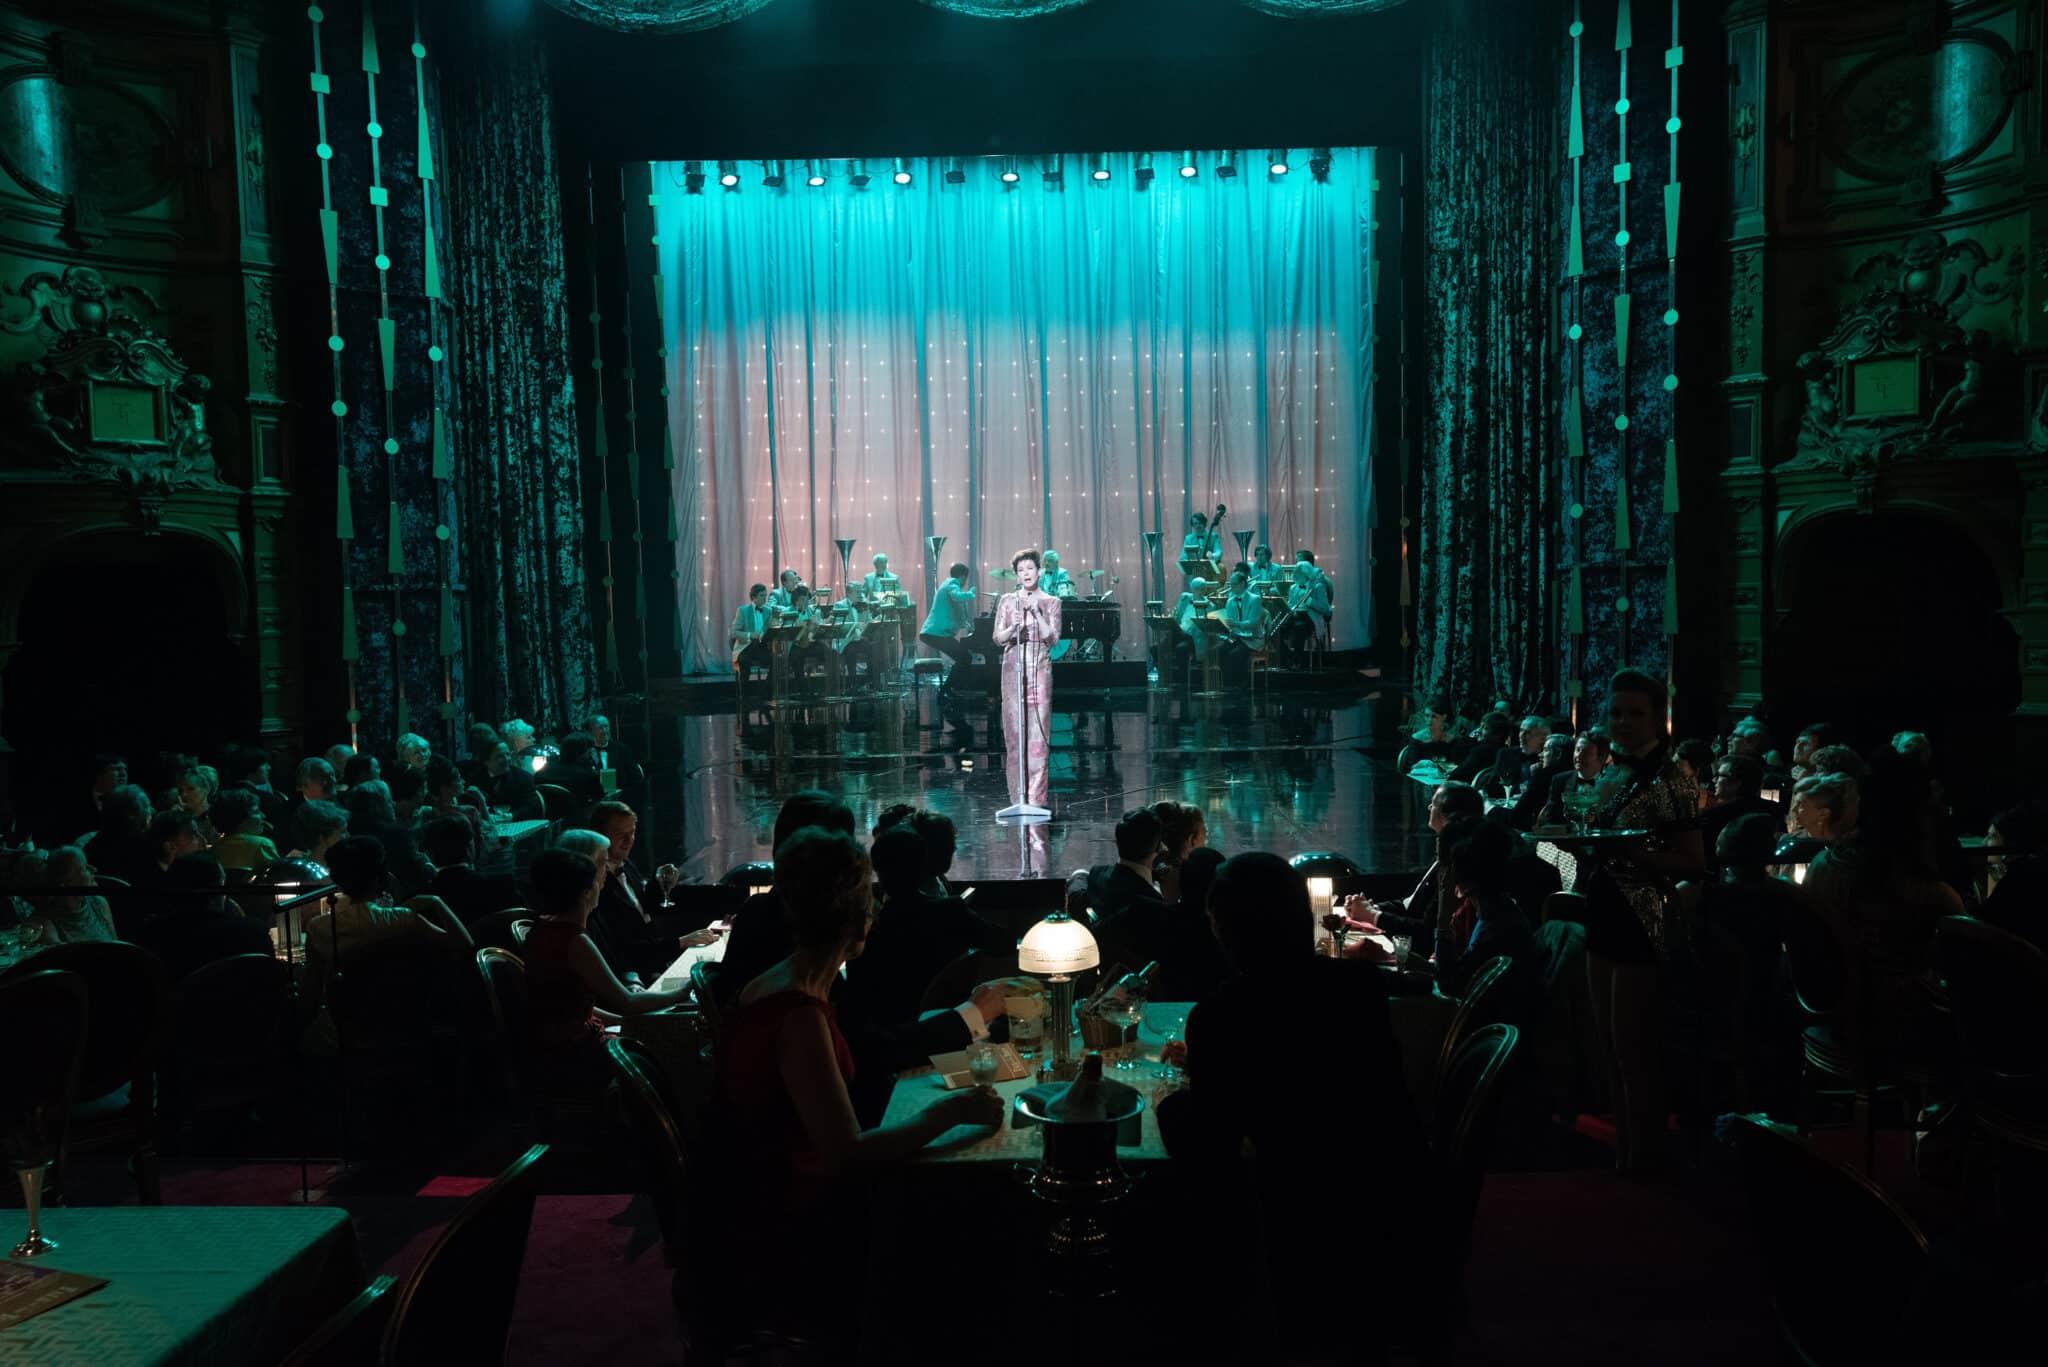 Renée Zellweger sur scène dans Judy